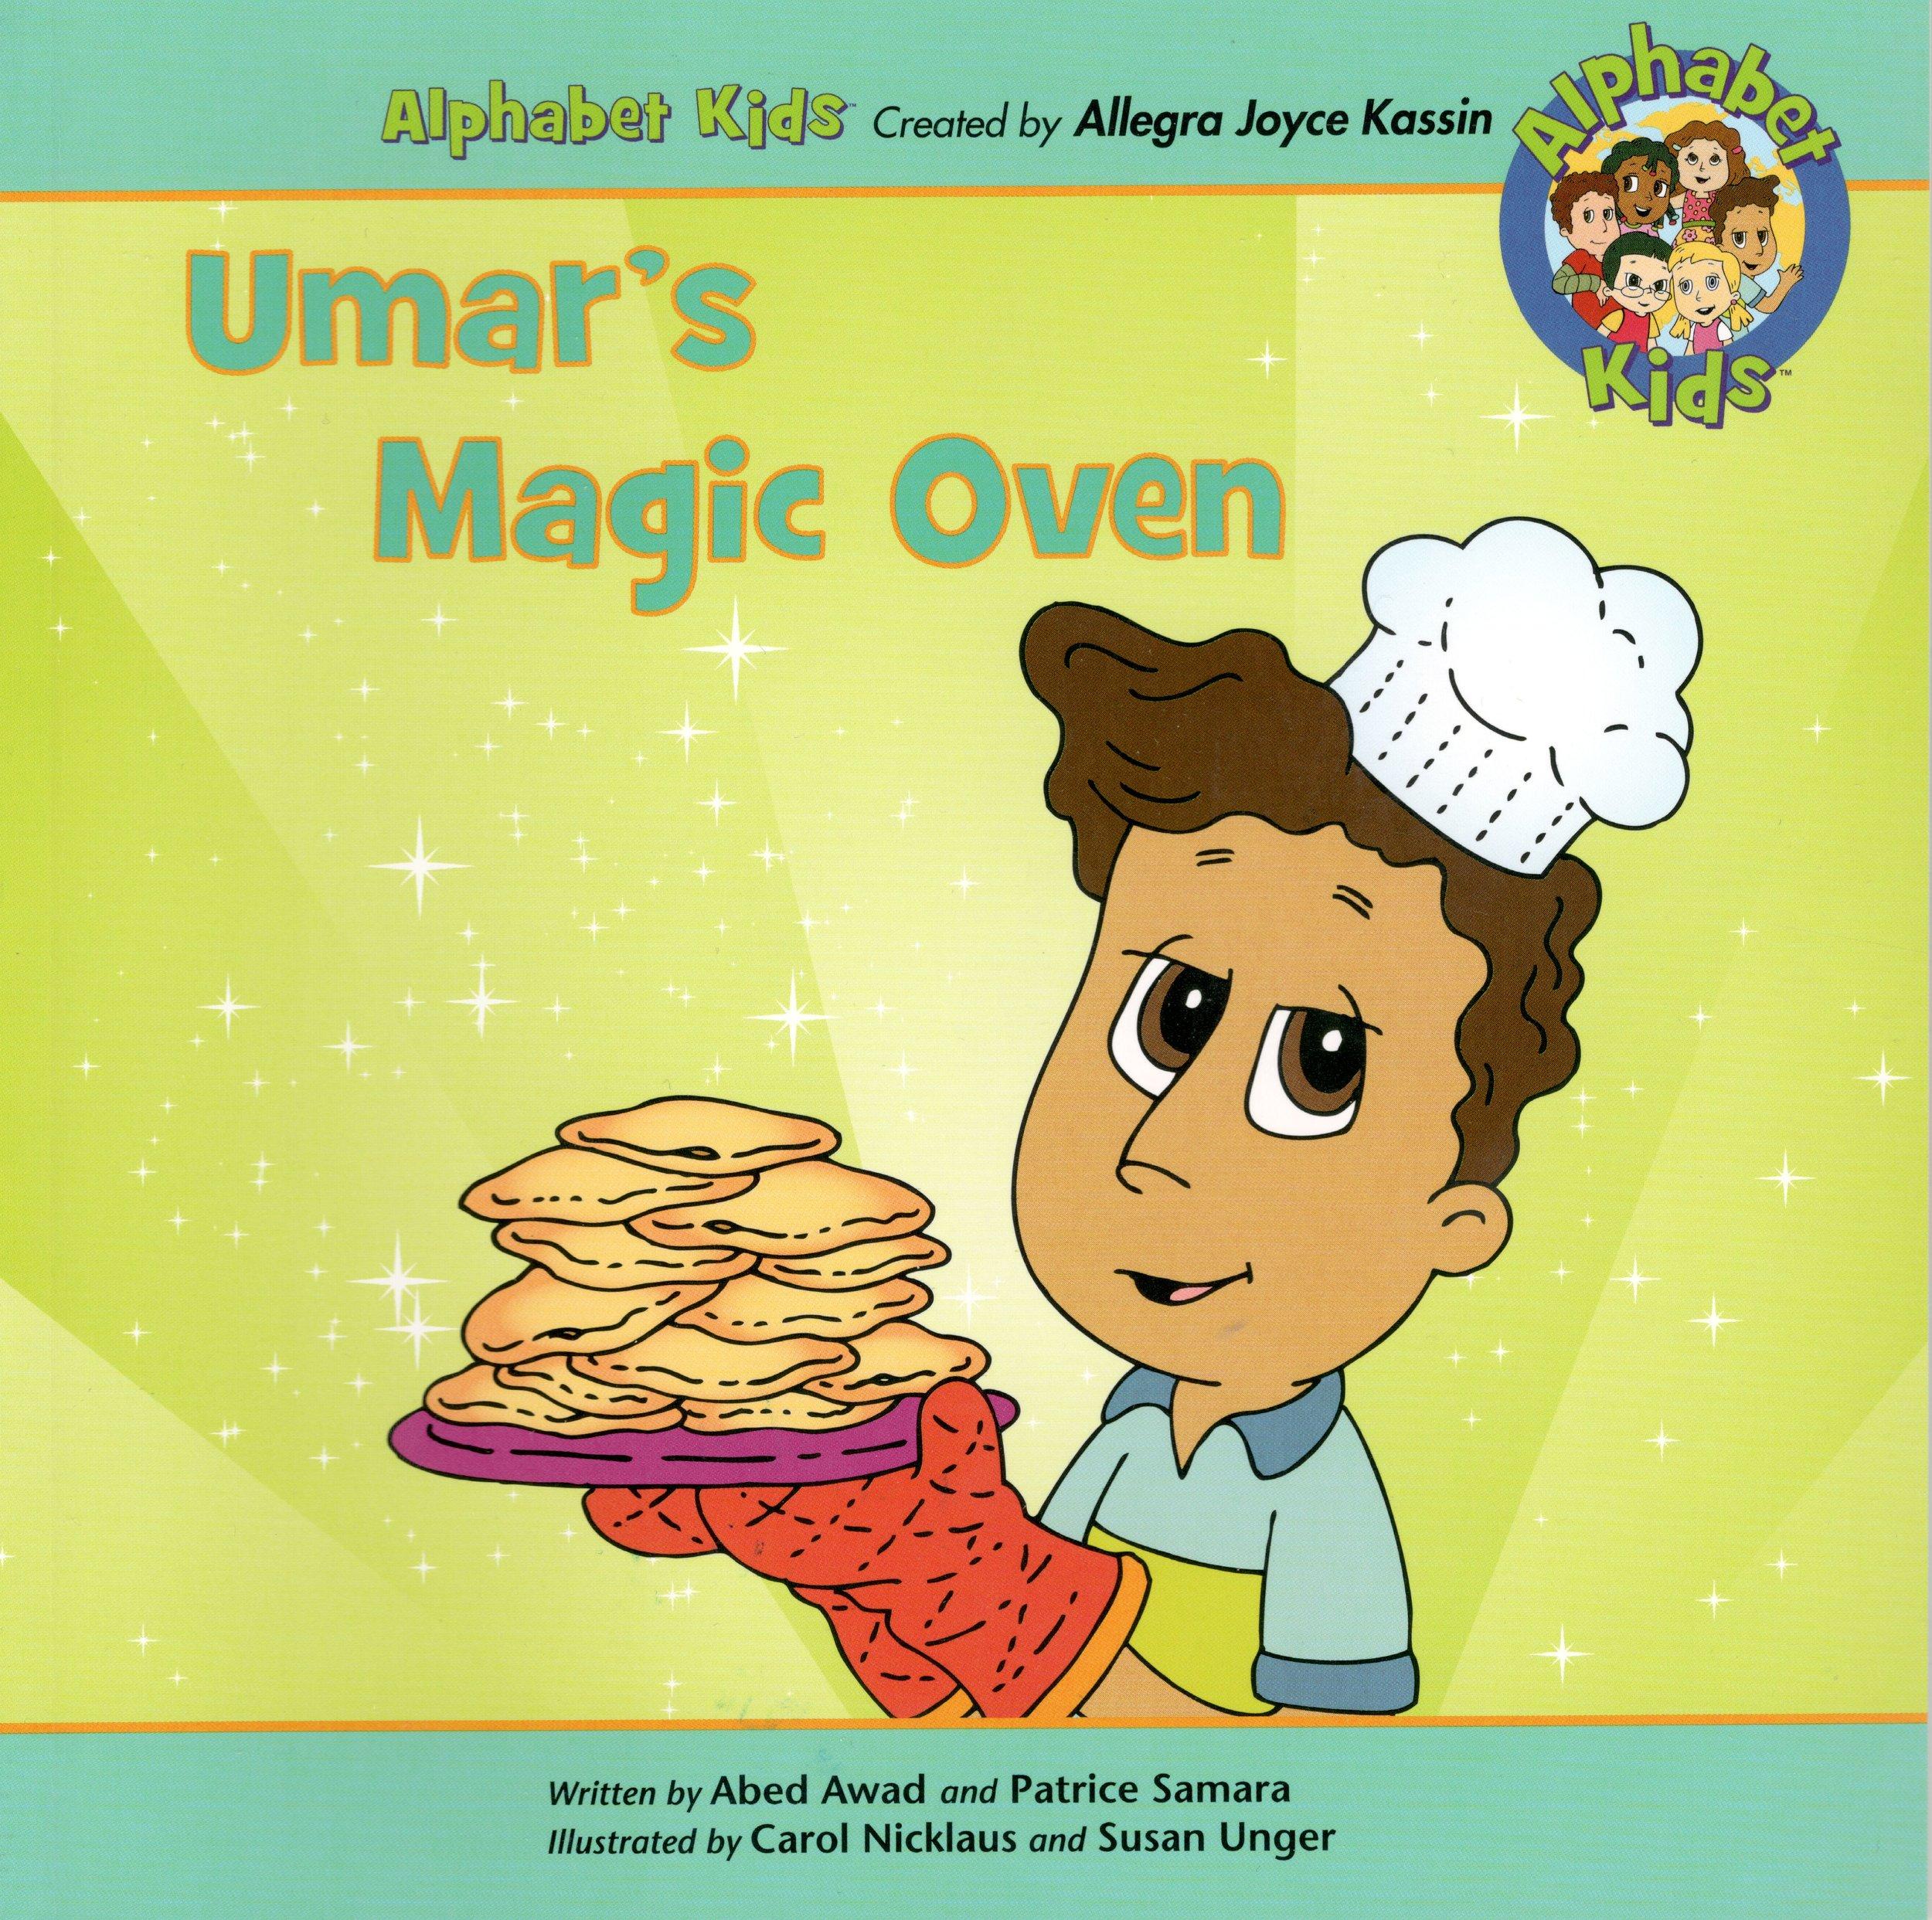 Umar's Magic Oven